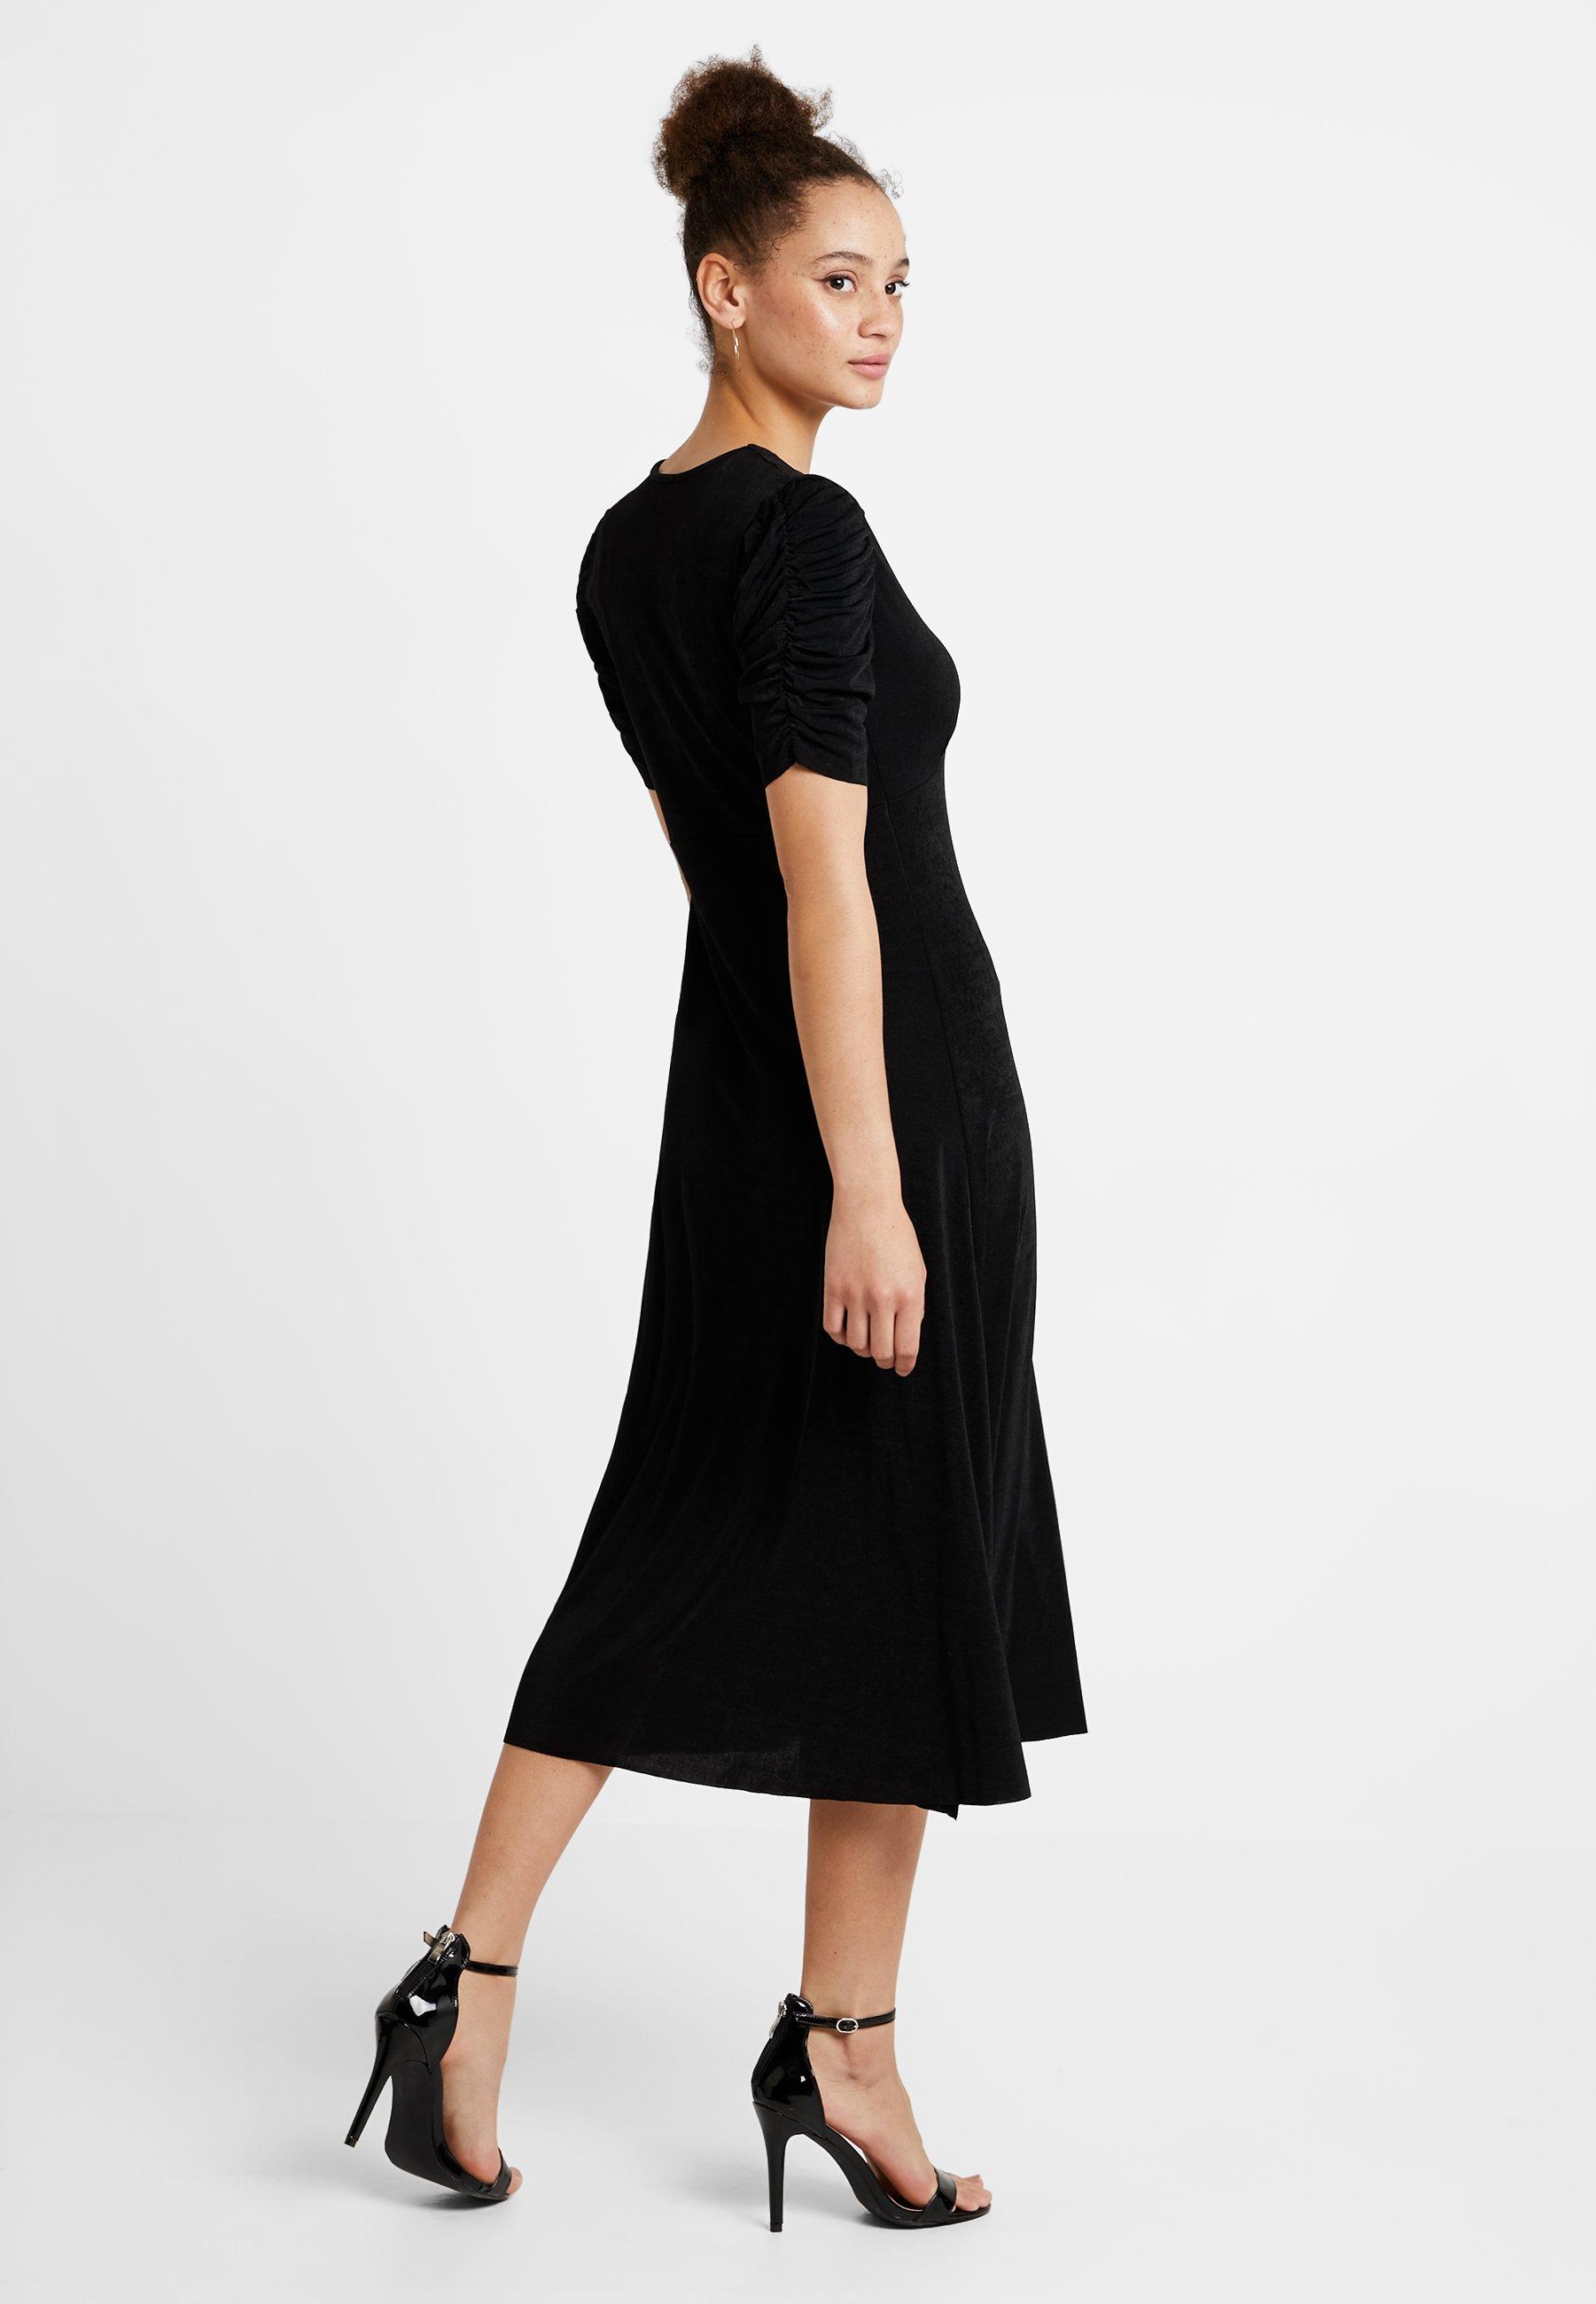 Yas Yas Longue DressRobe Black DressRobe Yasbalina Yasbalina 4Lj5qA3R